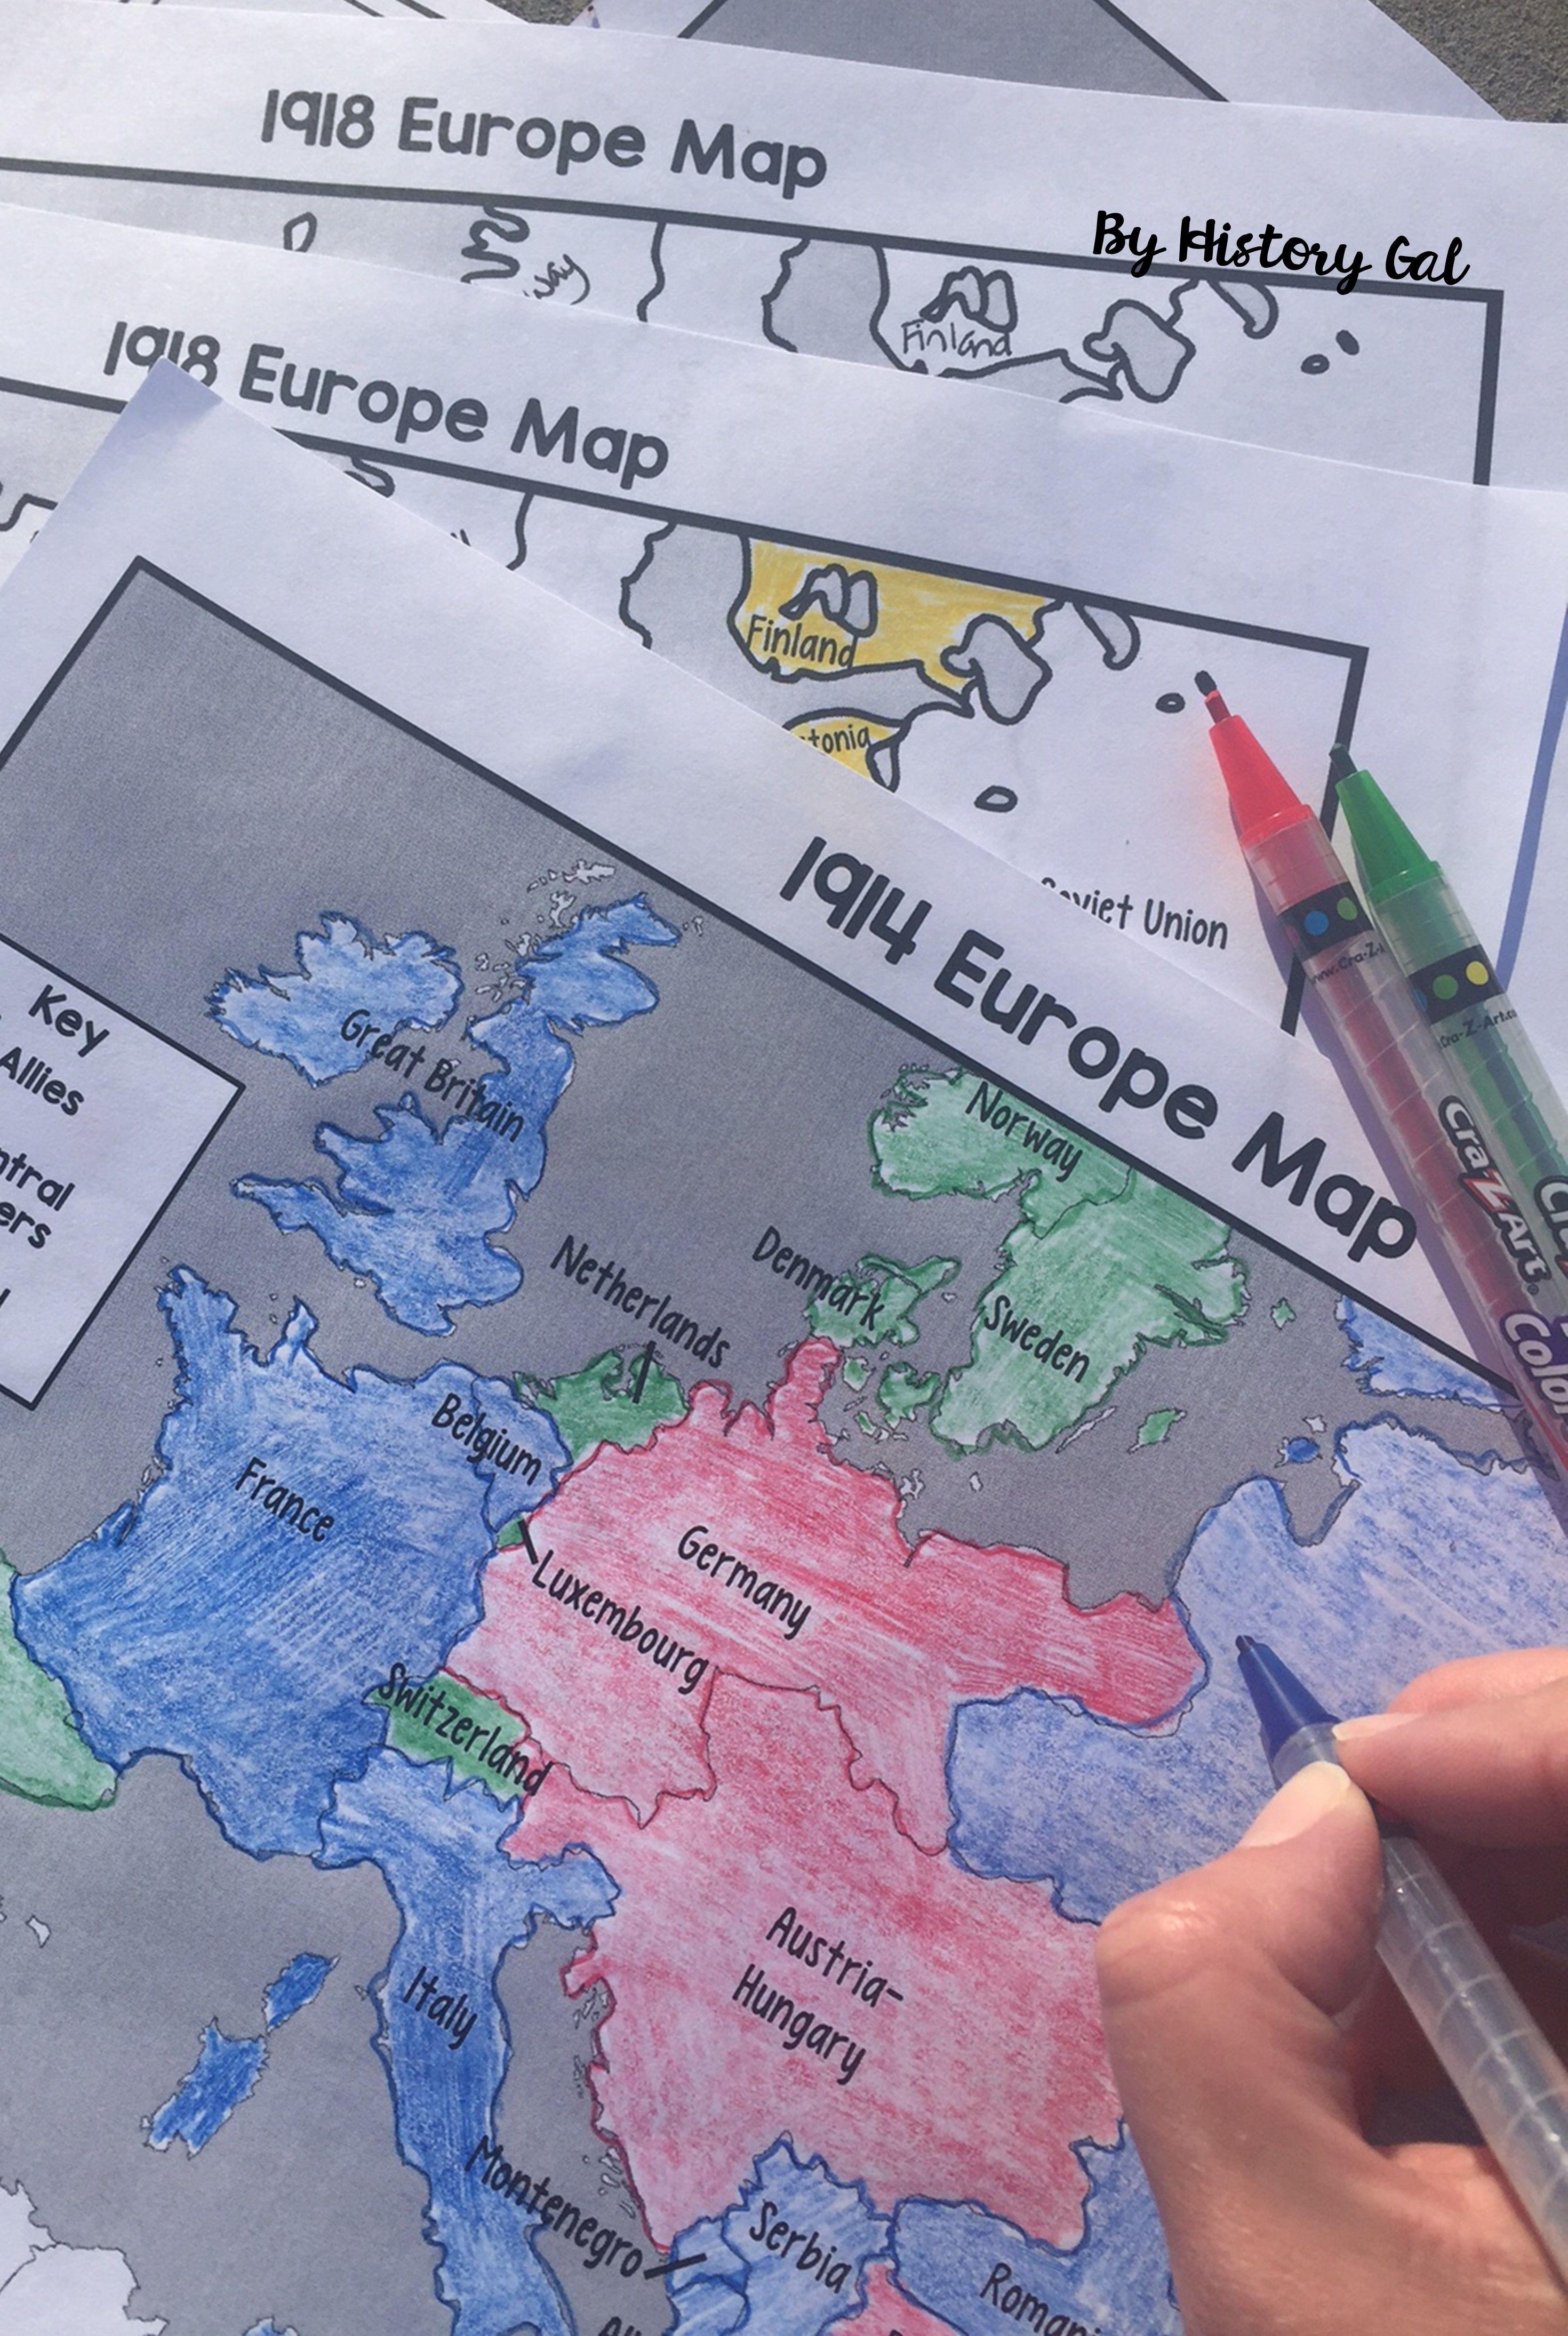 World War I (World War 1) 1914 and 1918 Europe Maps | Worksheets ...